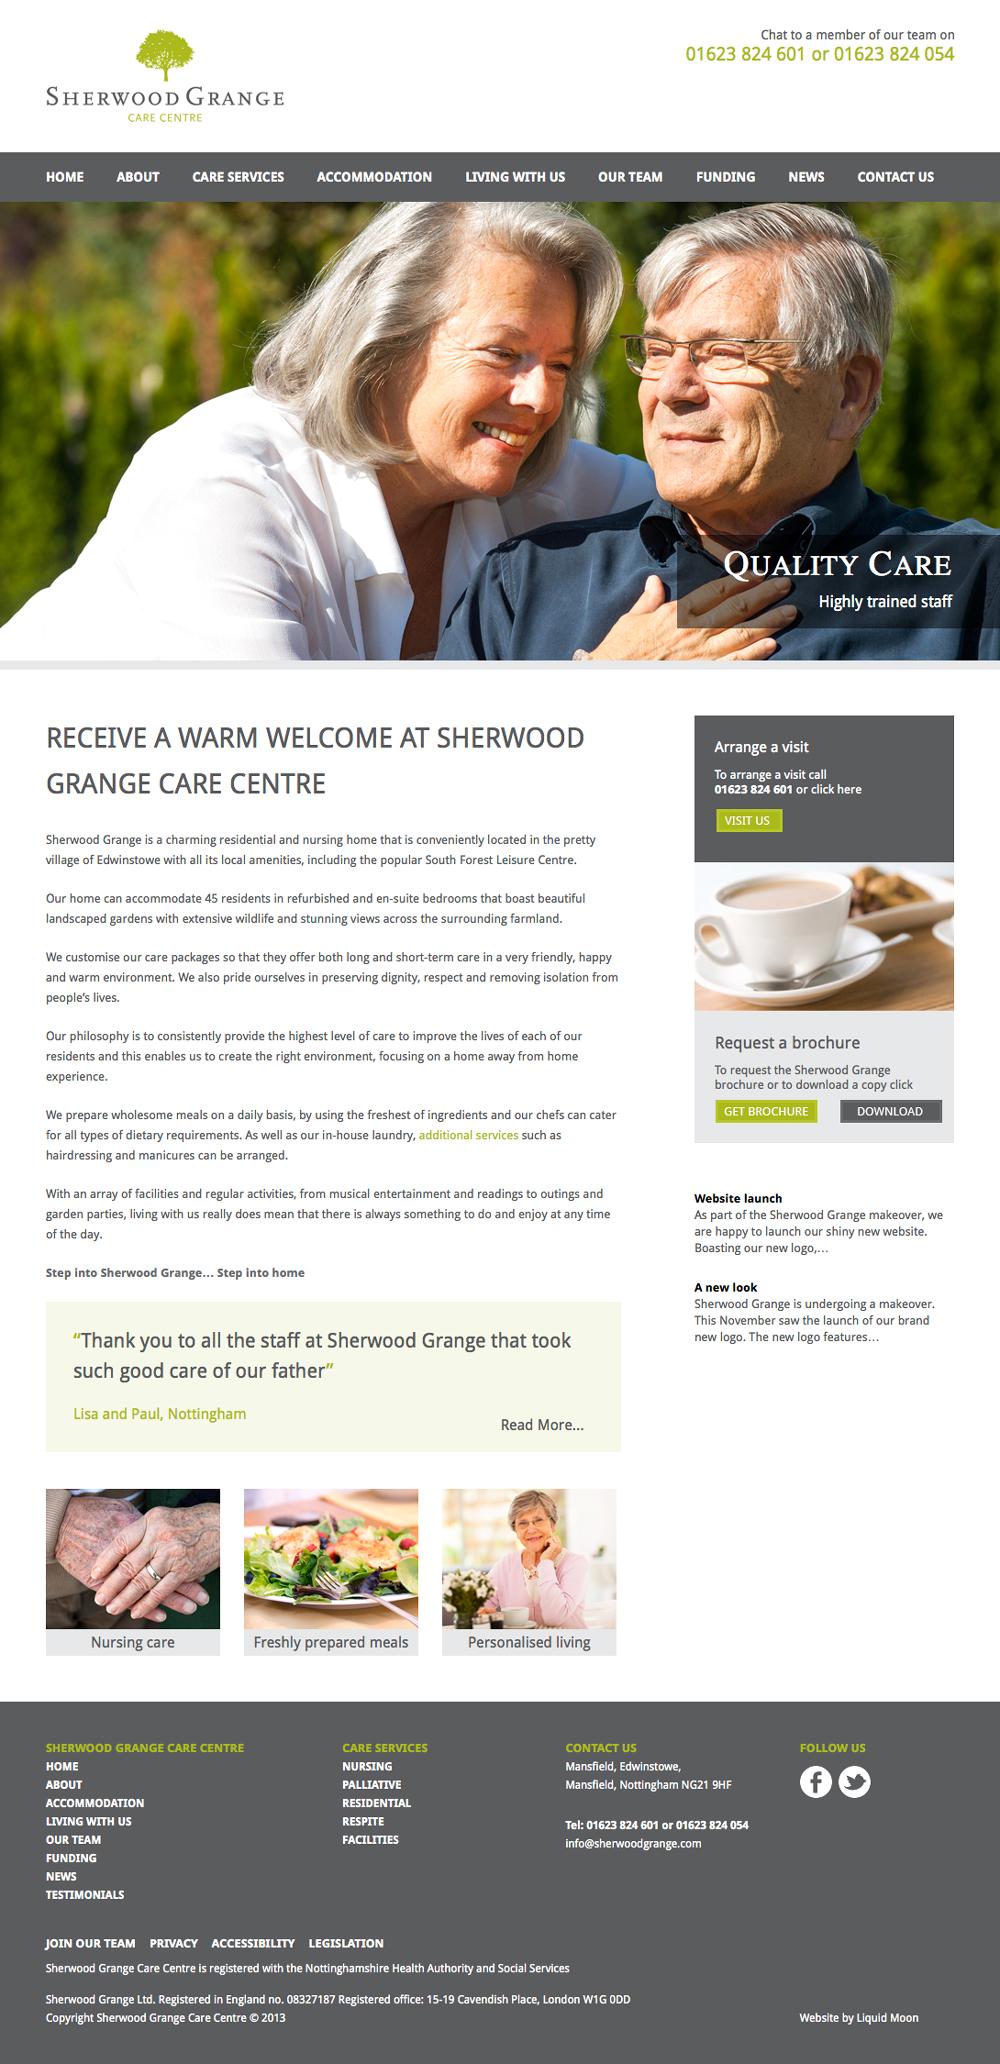 Sherwood Grange Care Centre website